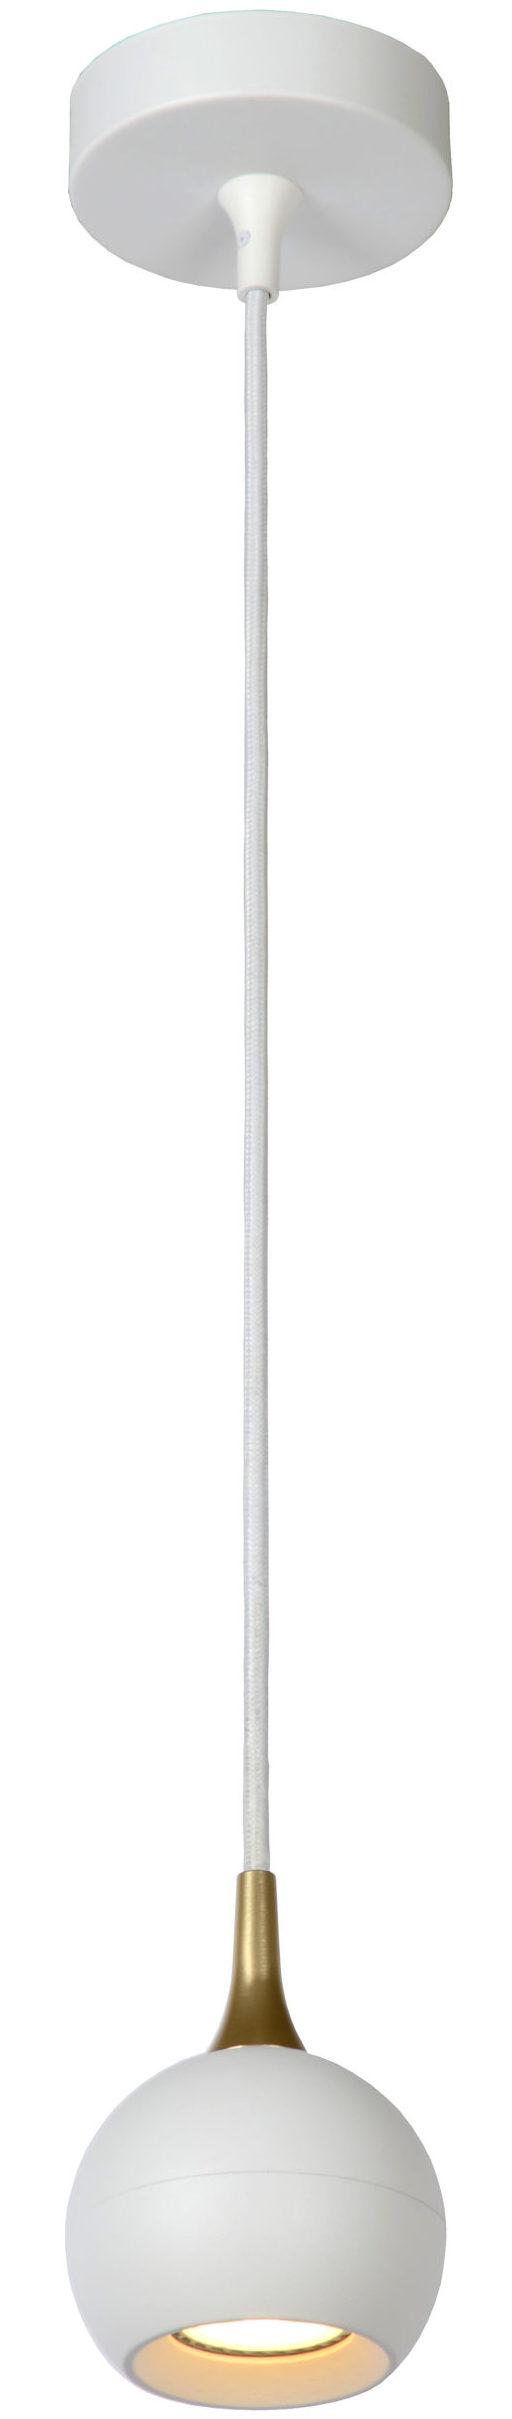 Favori hanglamp - mat goud / messing Lucide Hanglamp 09434/01/31